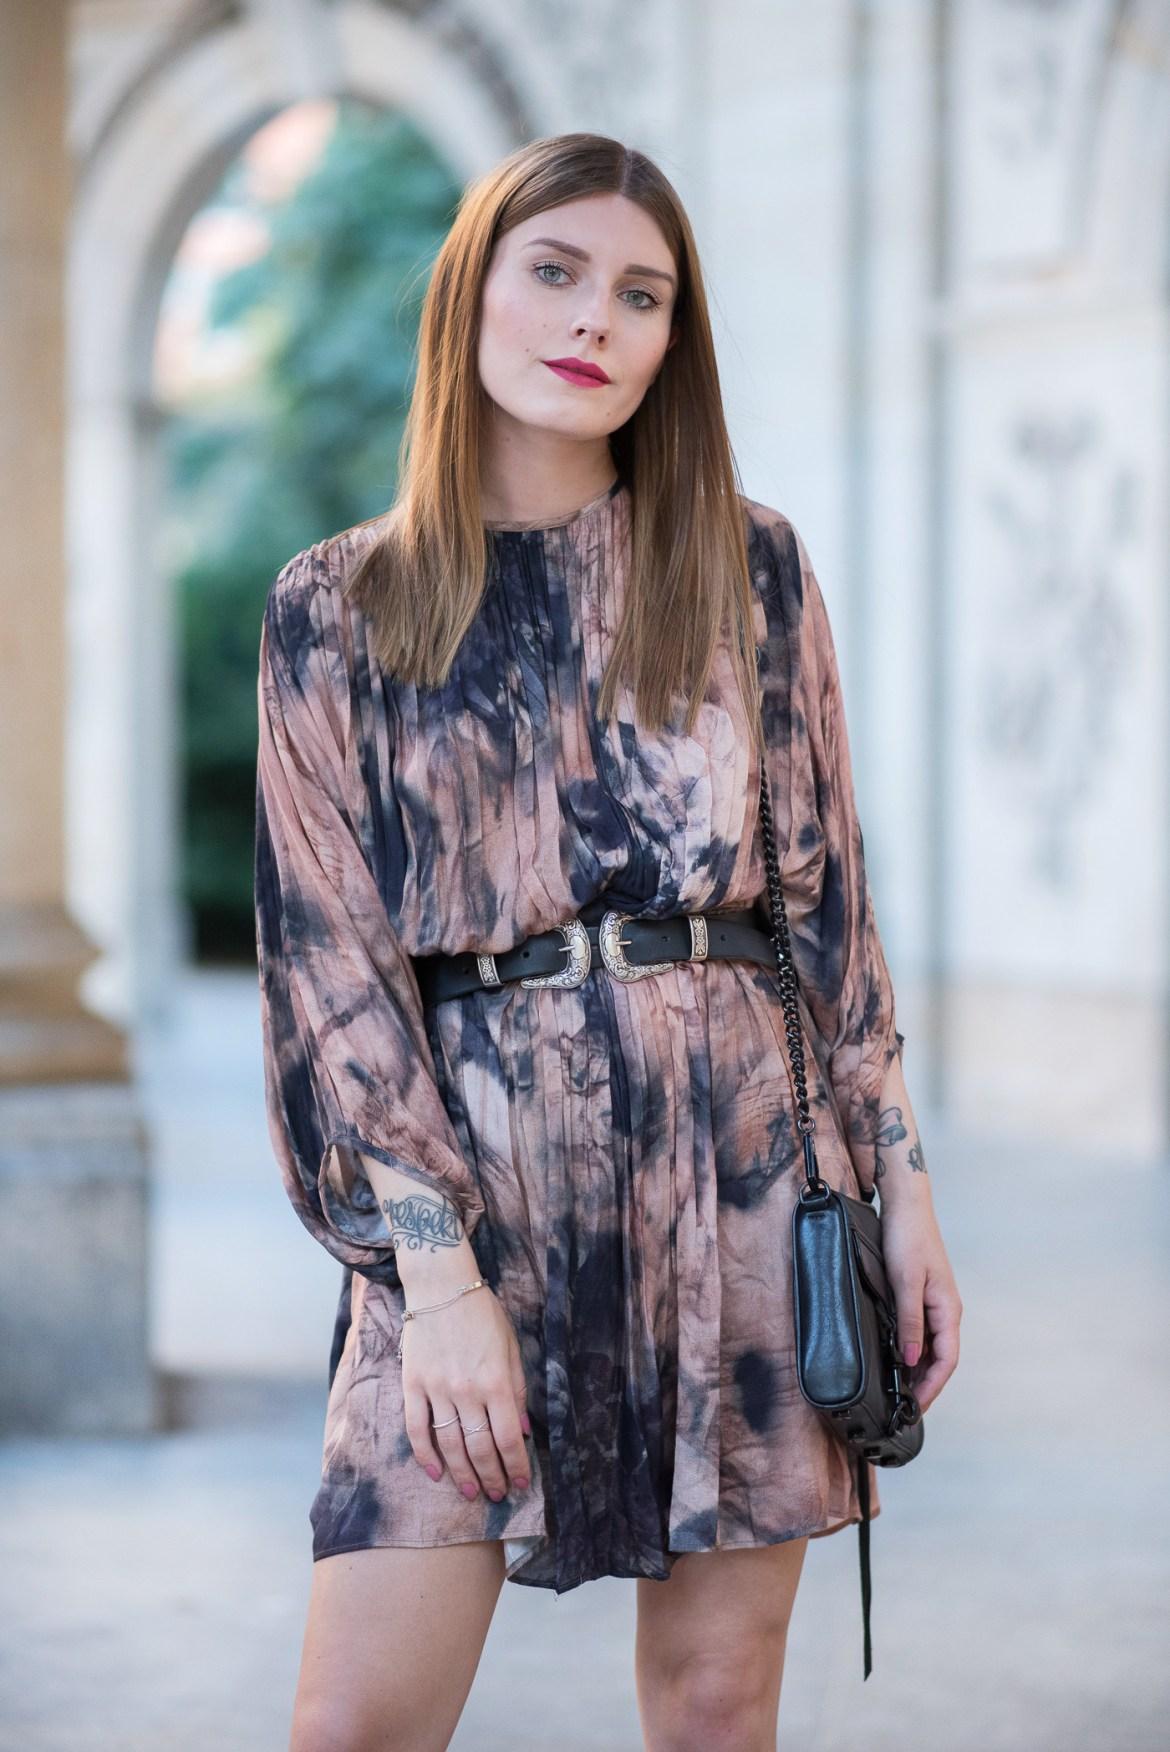 Berlin_Fashion_Week_Ready_Outfit_6